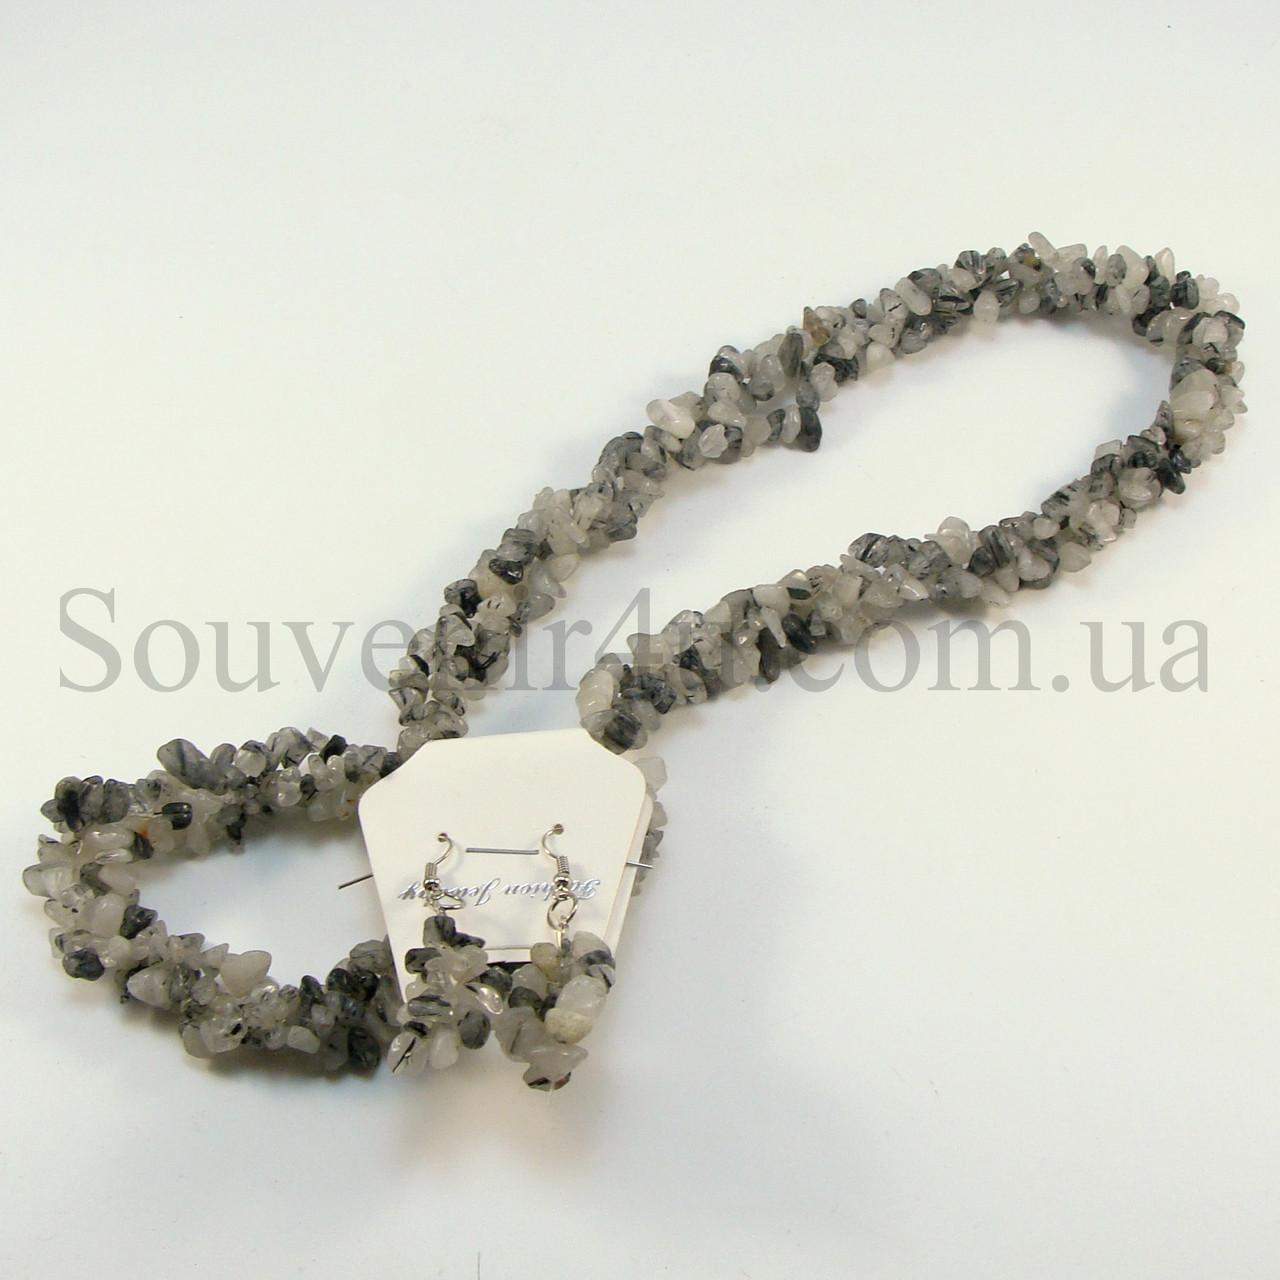 Комплект из мохового агата - Сувениры оптом в Одессе